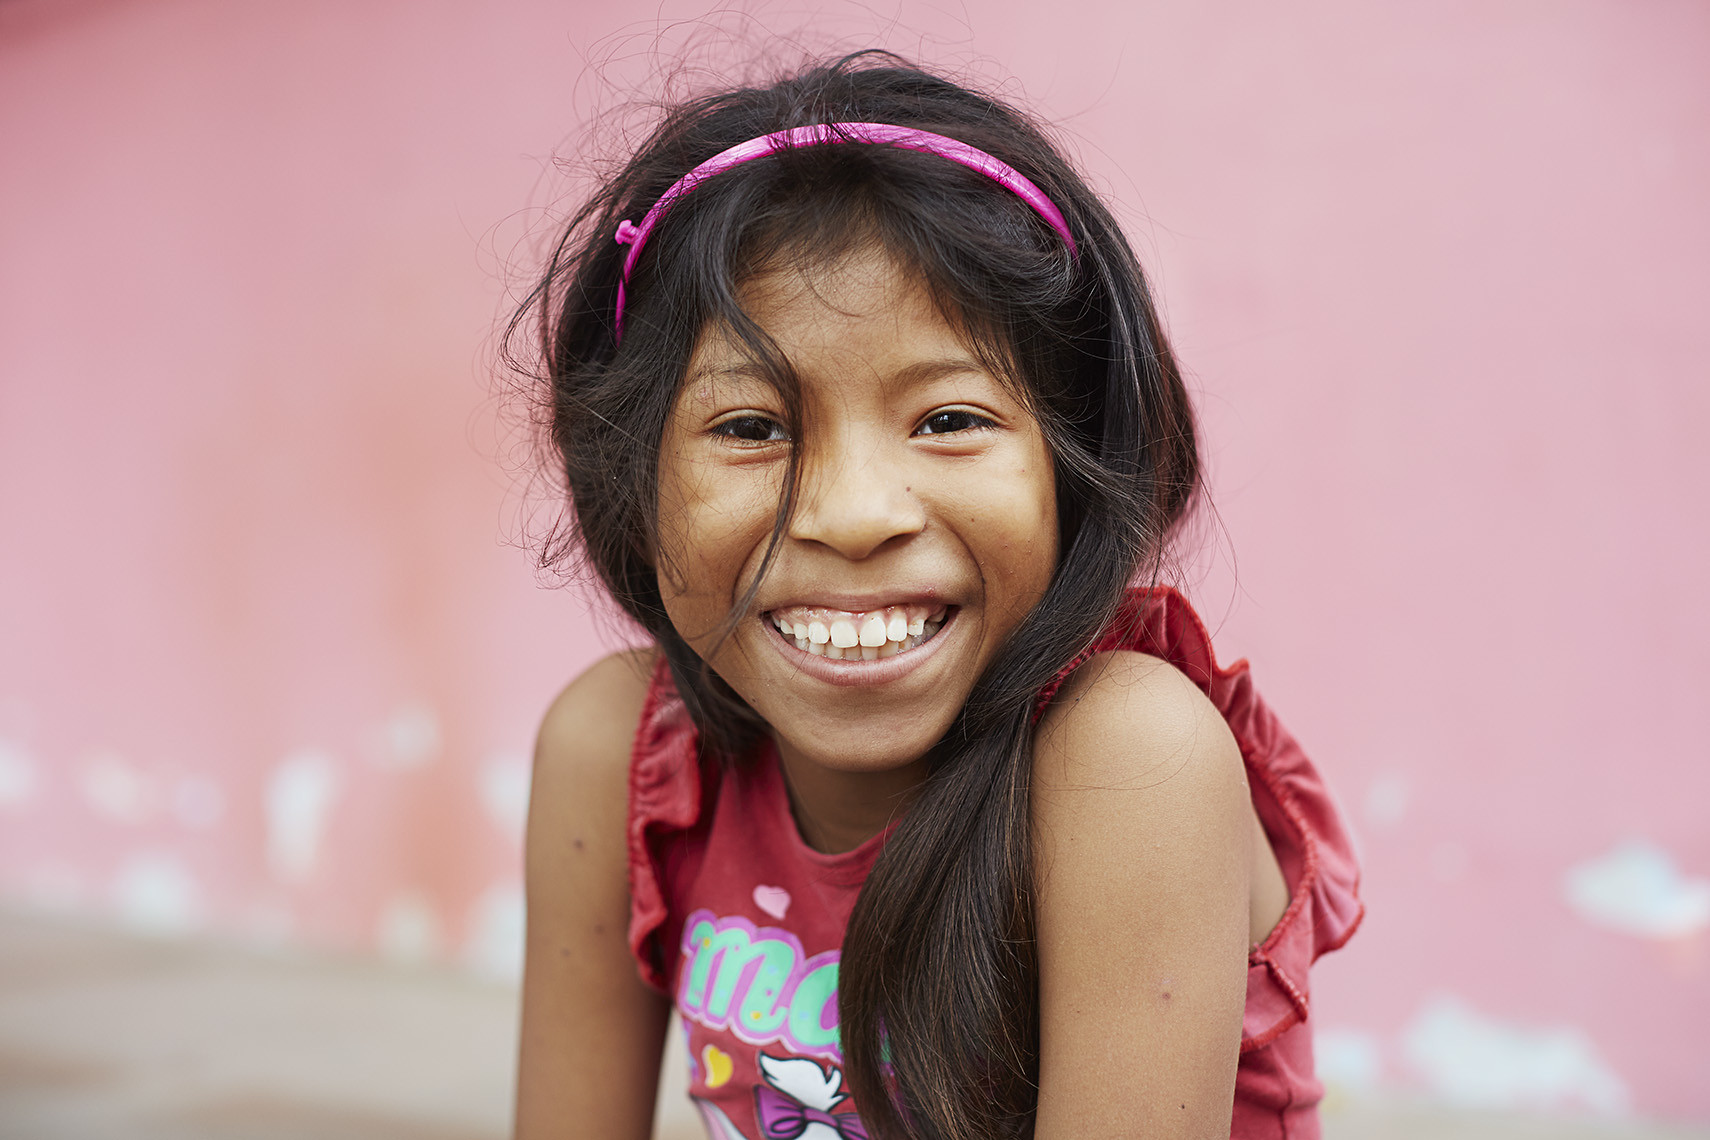 Ecuador_Esmeraldas1990_Children's Villages.jpg